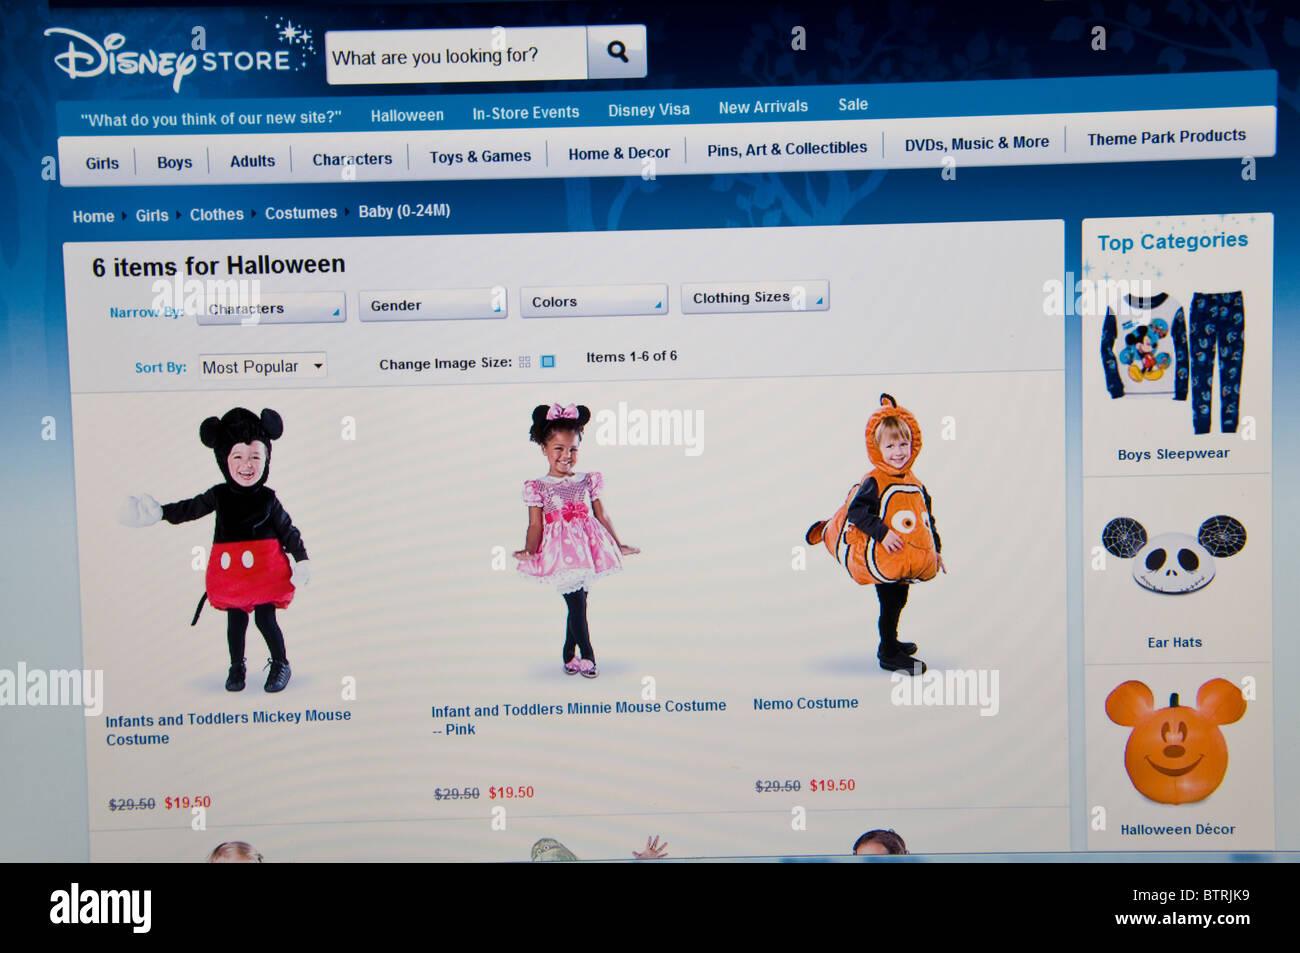 halloween disney store website online stock photo: 32481661 - alamy